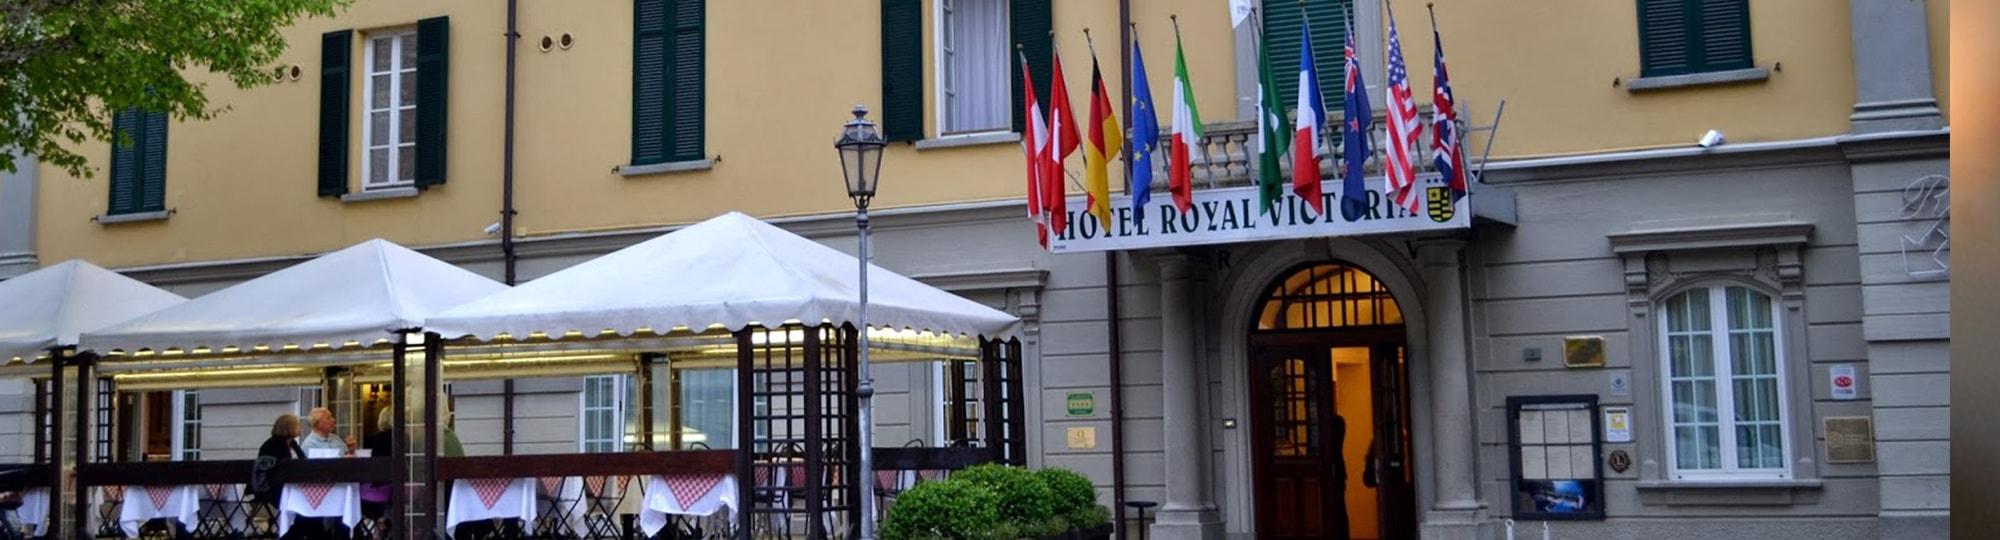 hotel royal victoria 4 r server l 39 hotel royal victoria. Black Bedroom Furniture Sets. Home Design Ideas